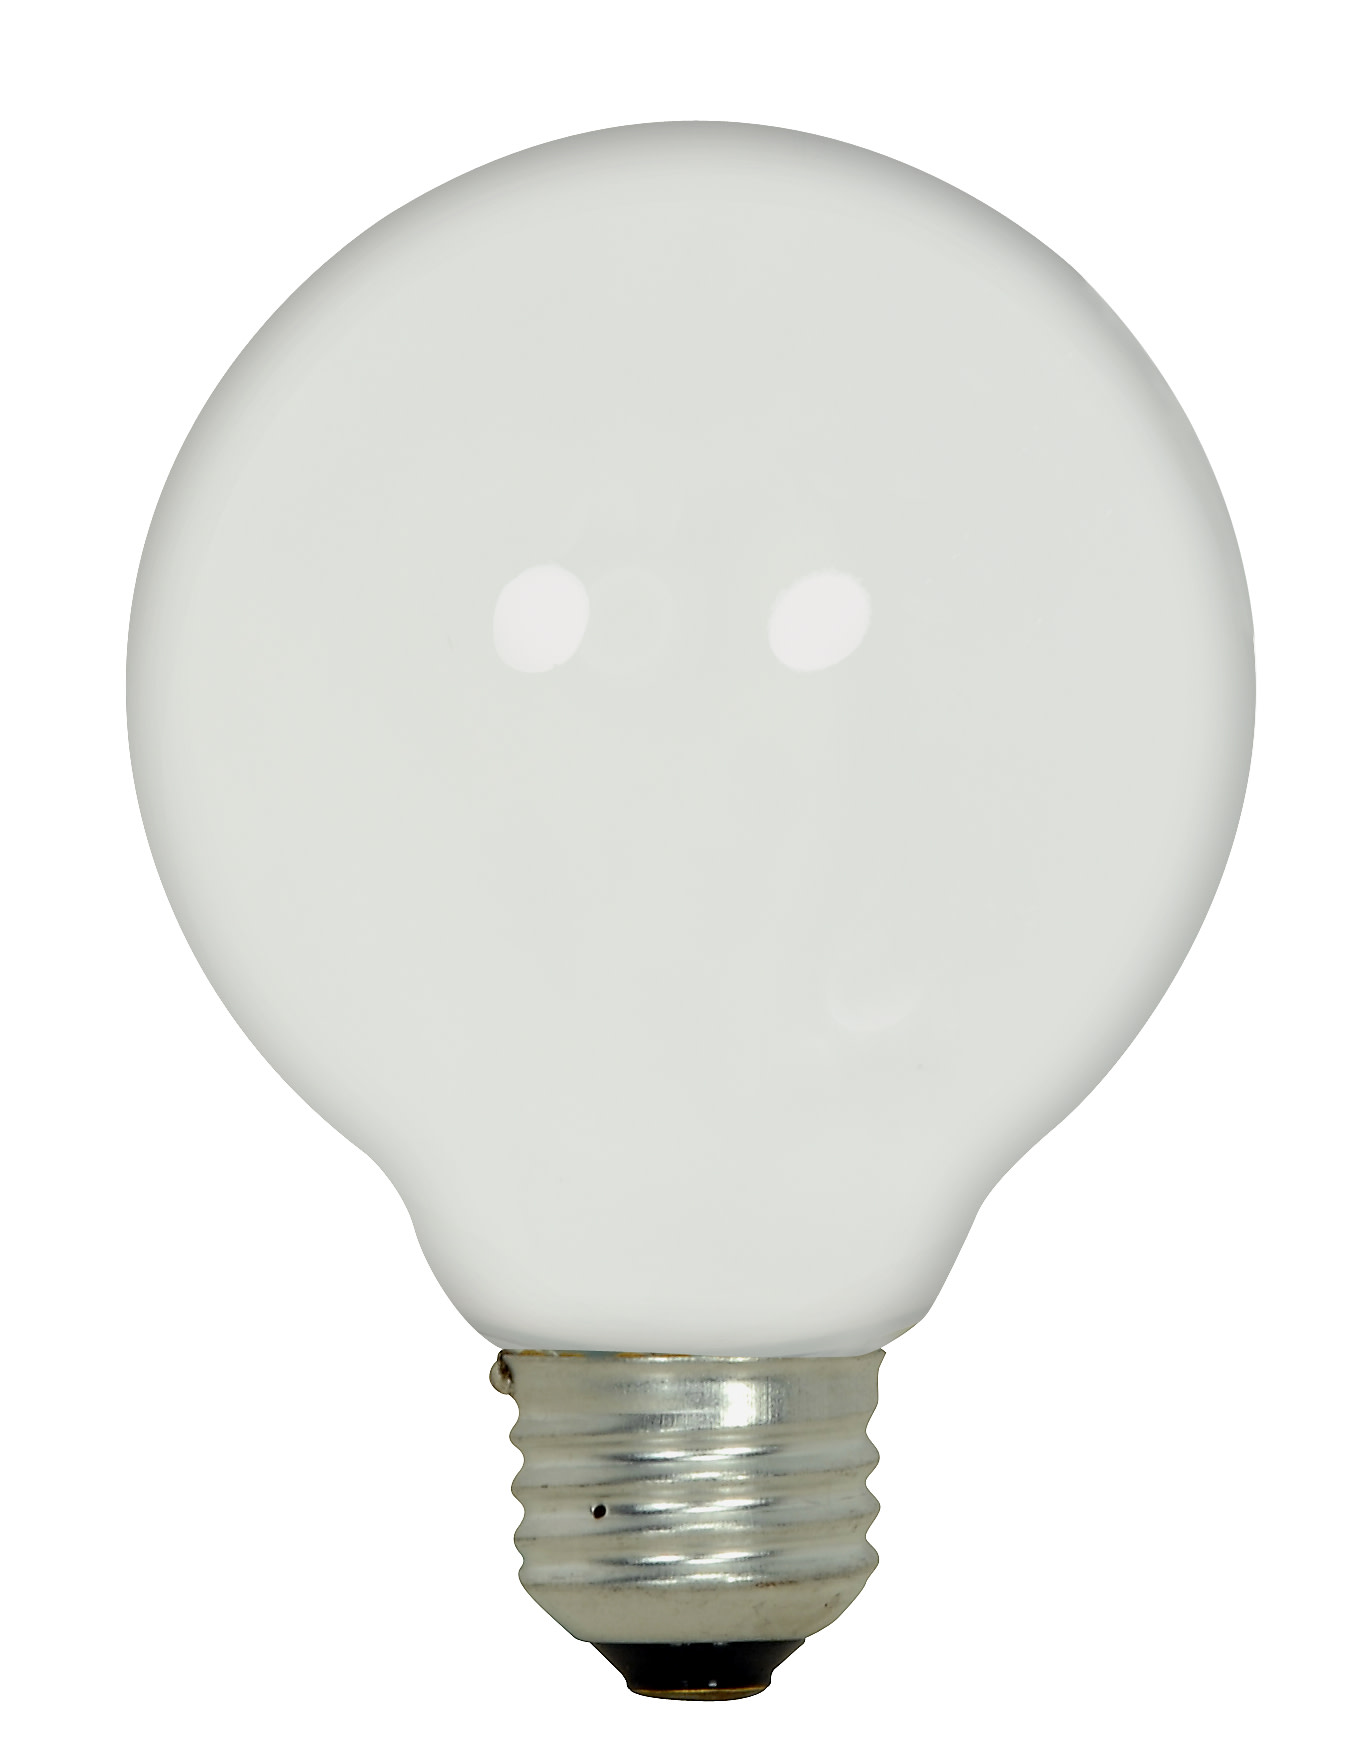 SATCO HALOGEN LAMP, G25 GLOBE, 43 WATTS, 120 VOLTS, MEDIUM BASE, WHITE, DIMMABLE, 3 PER PACK